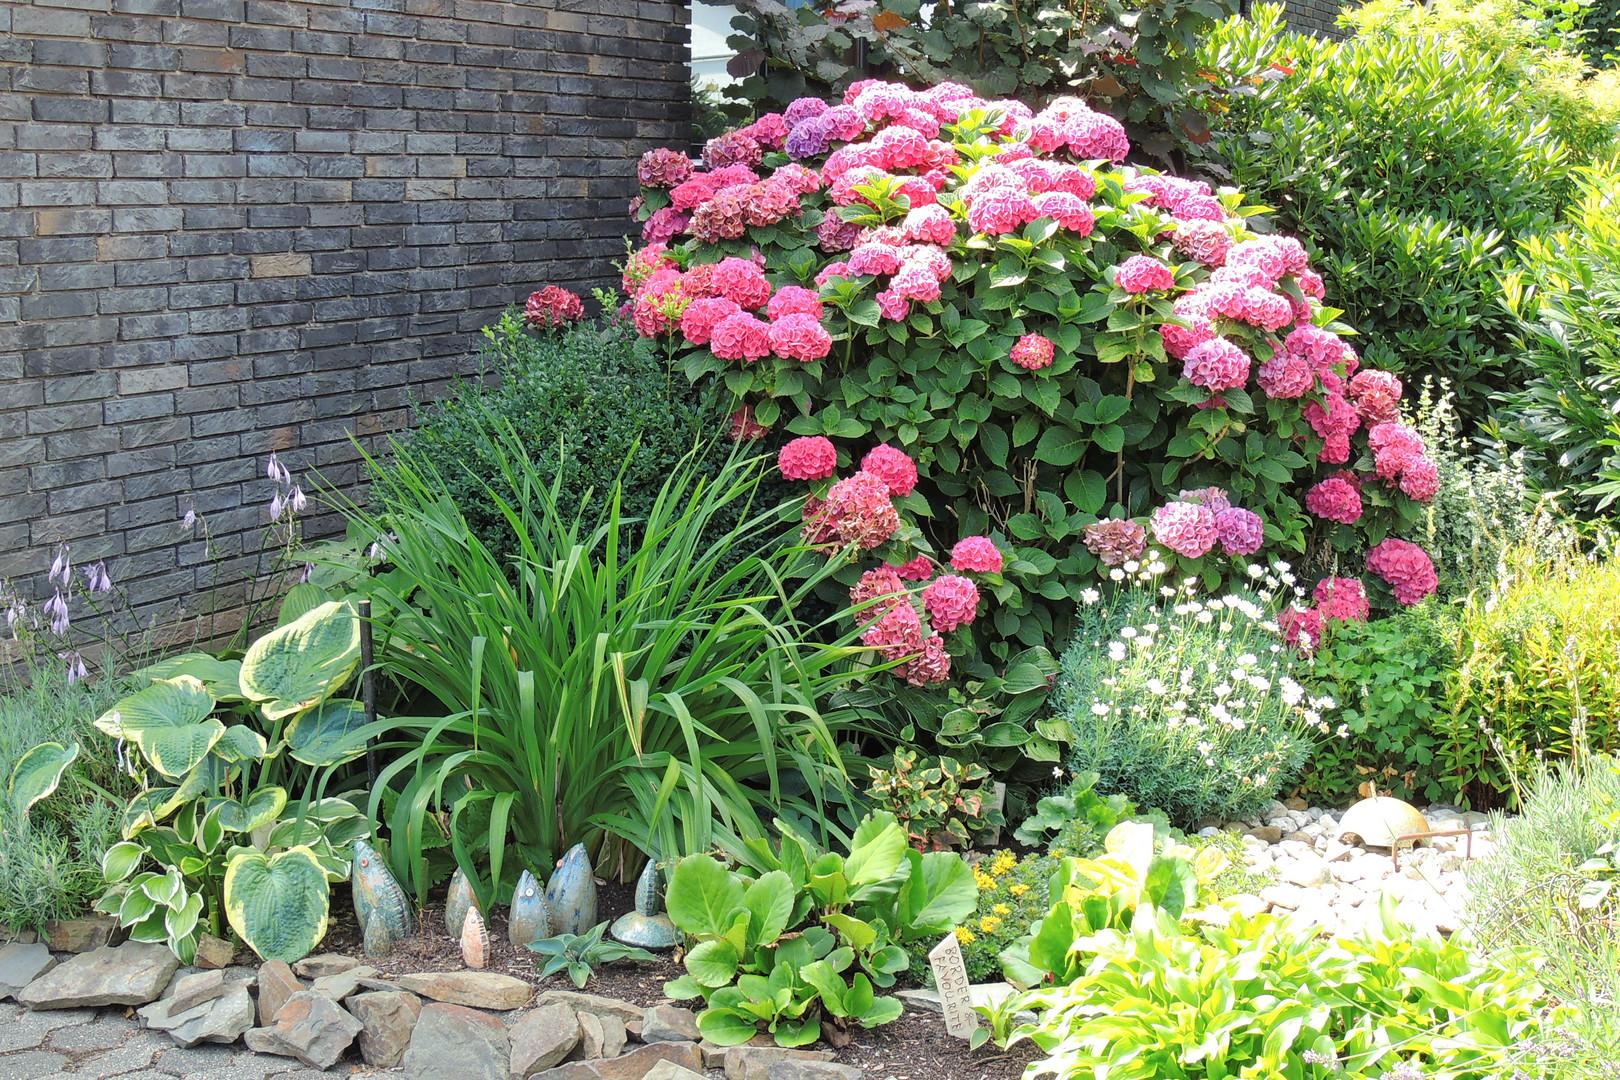 hortensien im vorgarten foto bild pflanzen pilze flechten bl ten kleinpflanzen. Black Bedroom Furniture Sets. Home Design Ideas